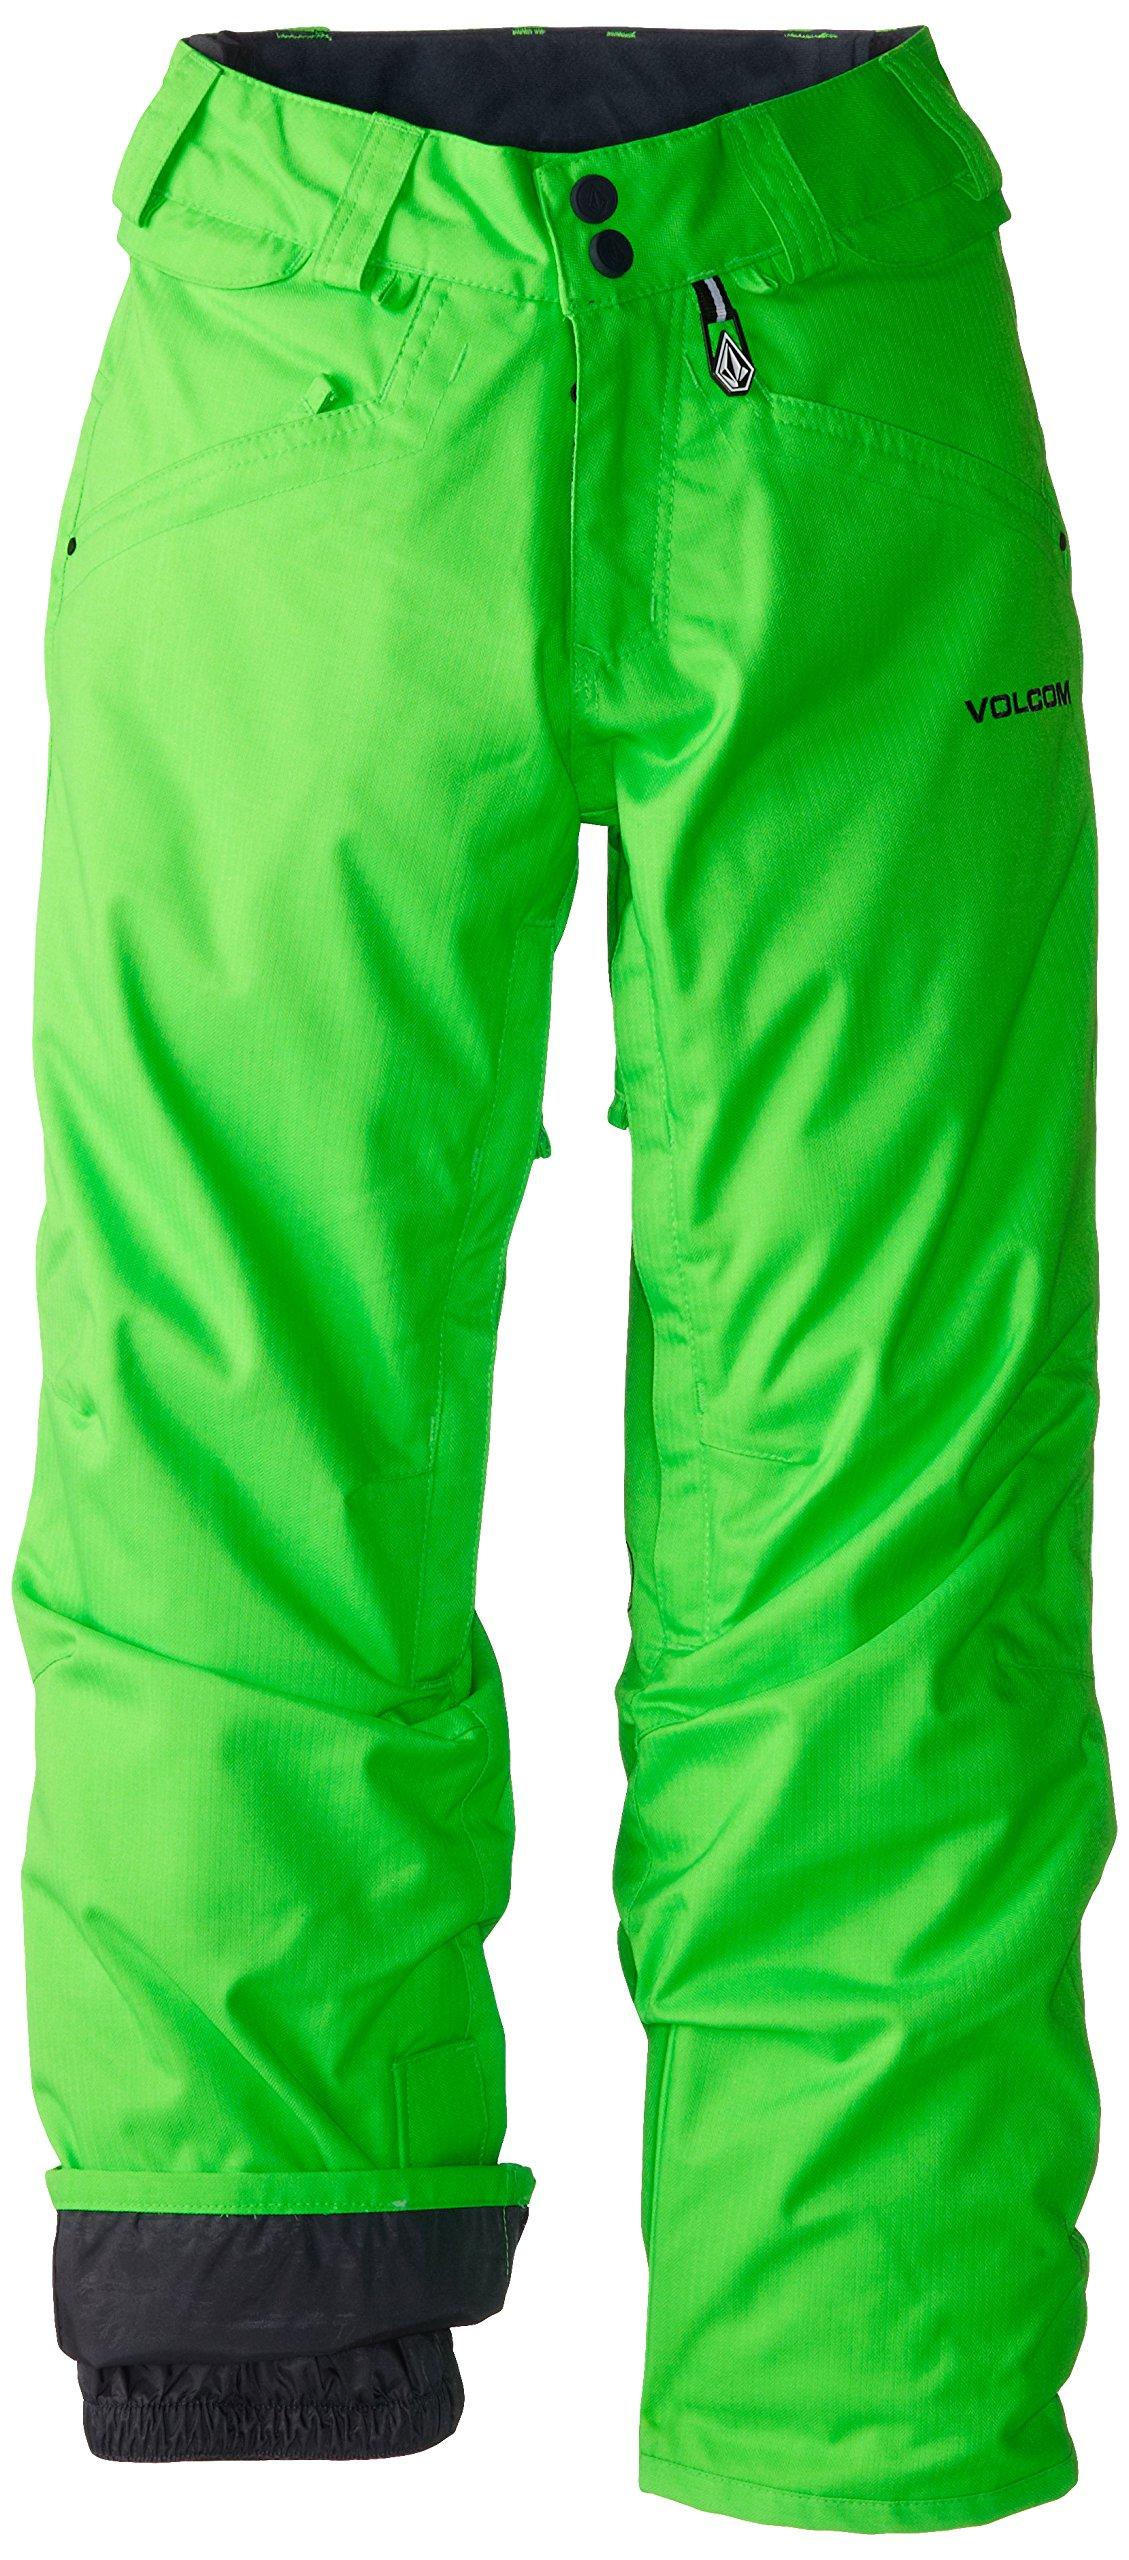 Volcom Big Boys' Battlefield Insulated Pant, Electric Green, Medium by Volcom (Image #1)